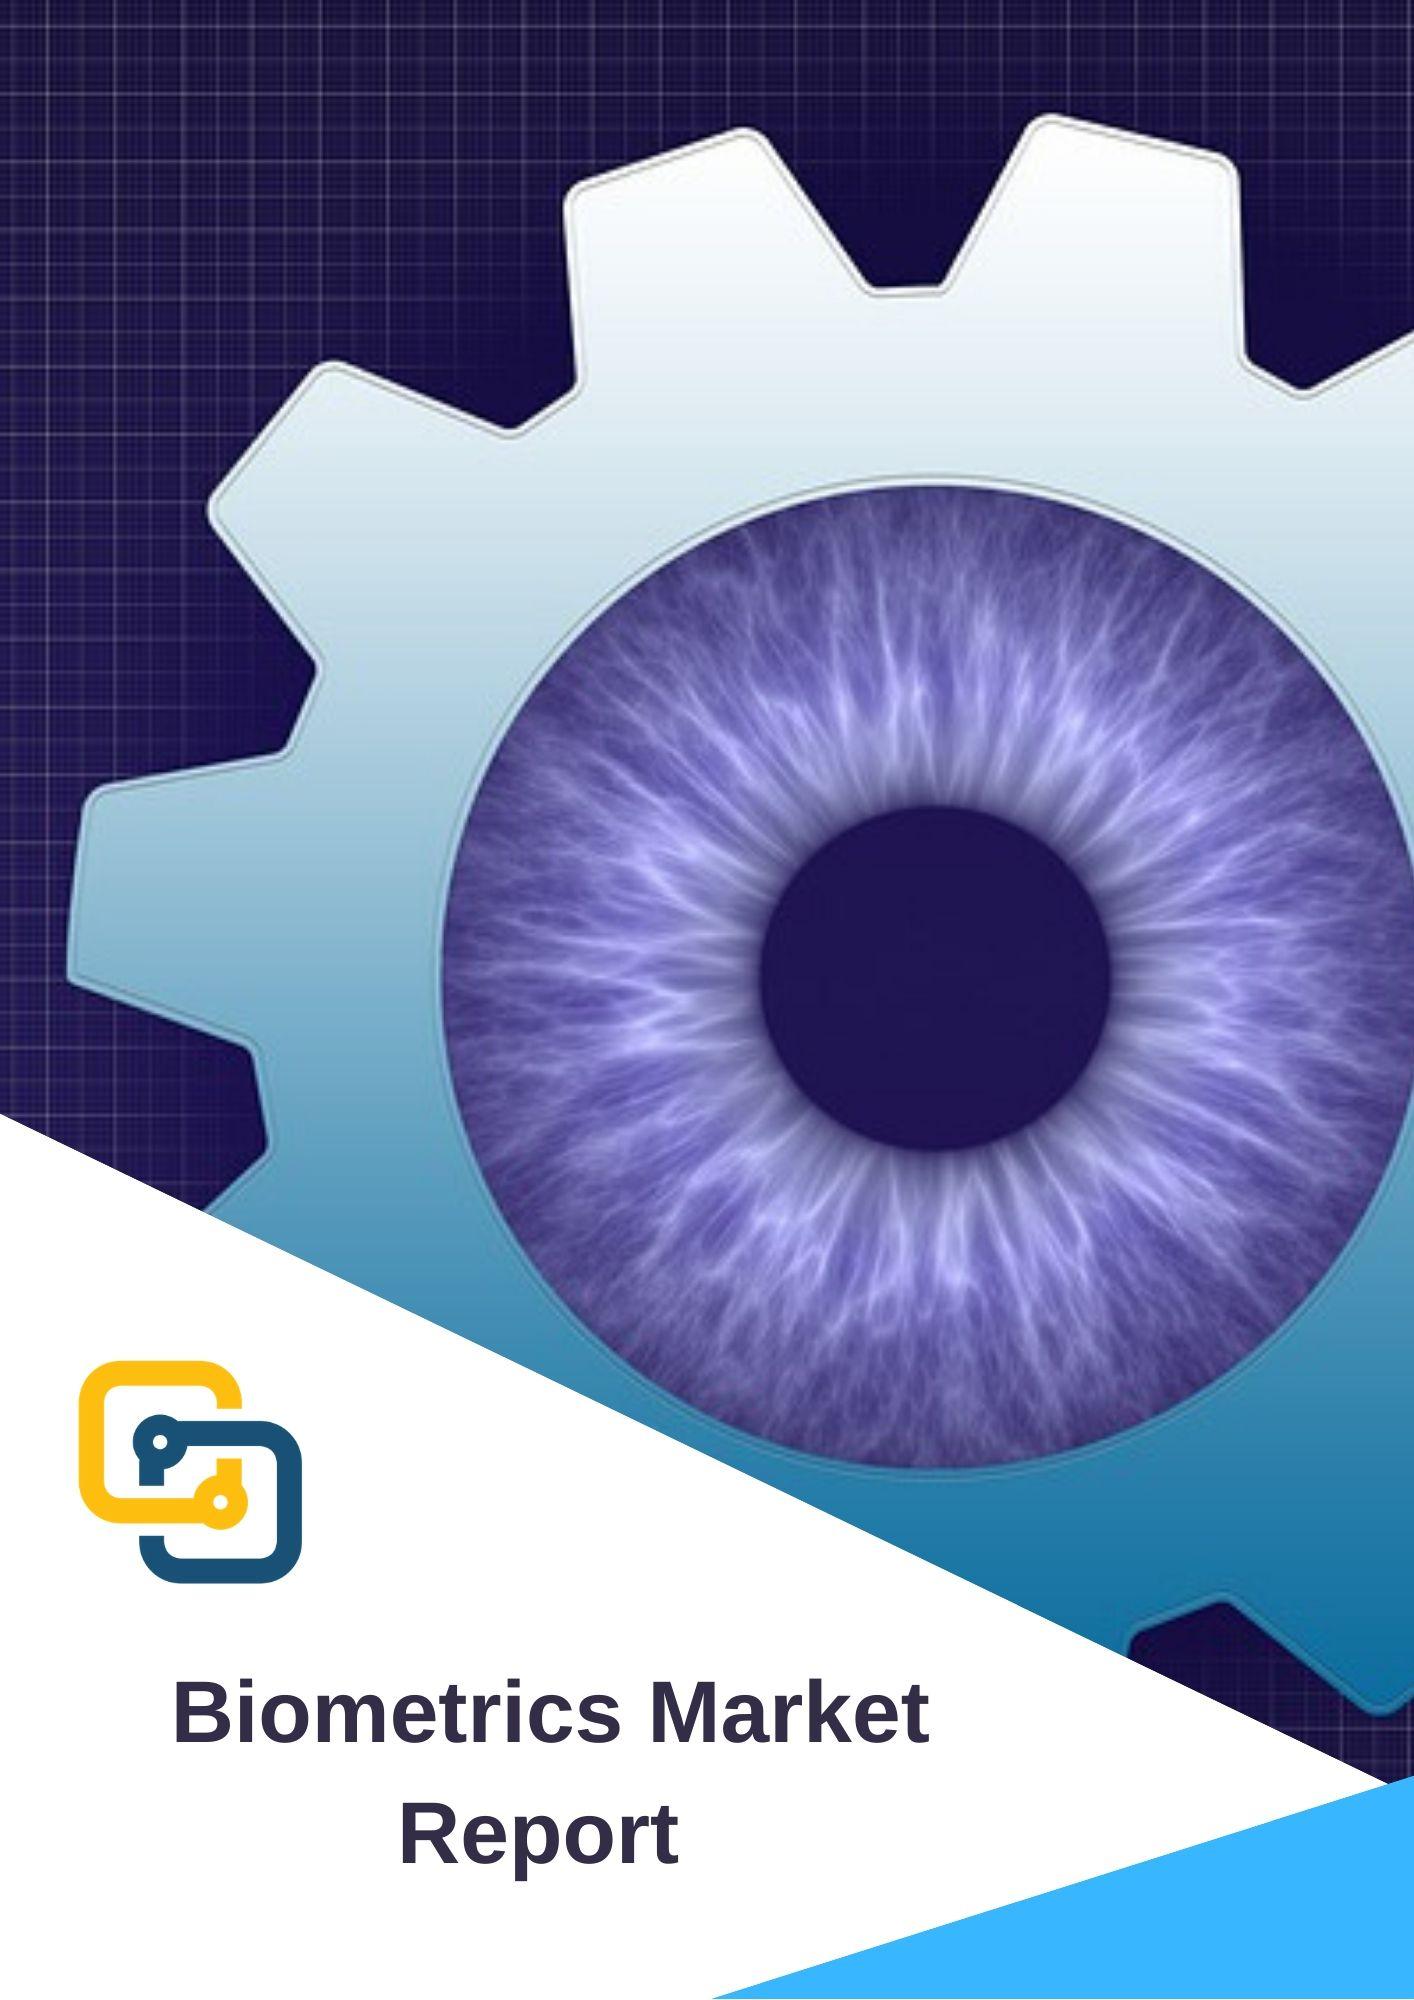 Global Biometrics Market Insight Competitive News Feed Analysis Market Sizing Forecasts to 2025